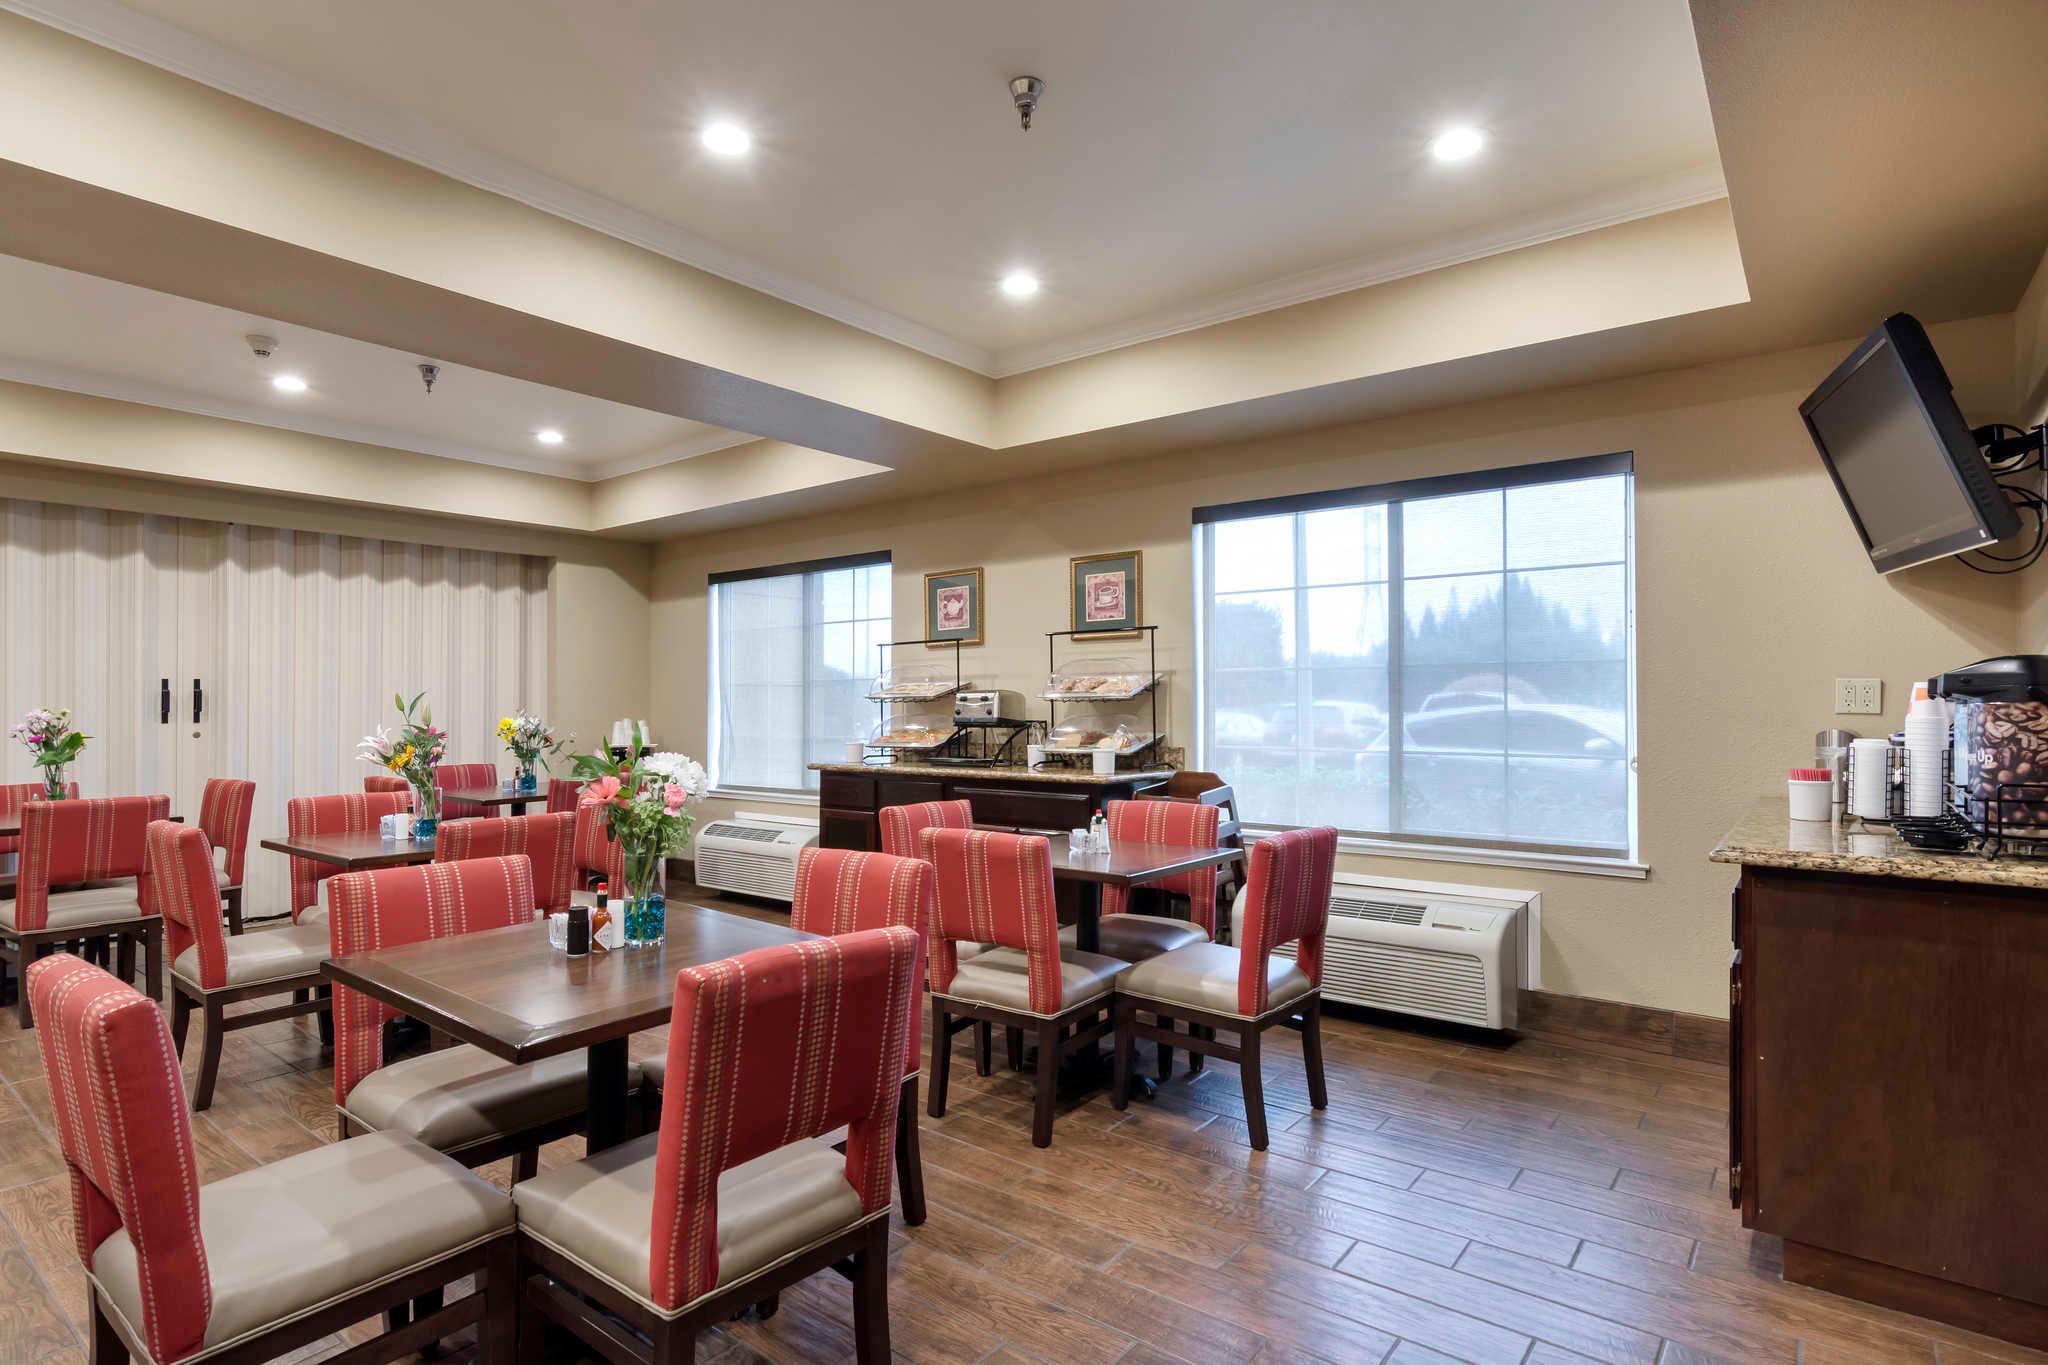 Comfort Inn & Suites Sacramento - University Area image 28